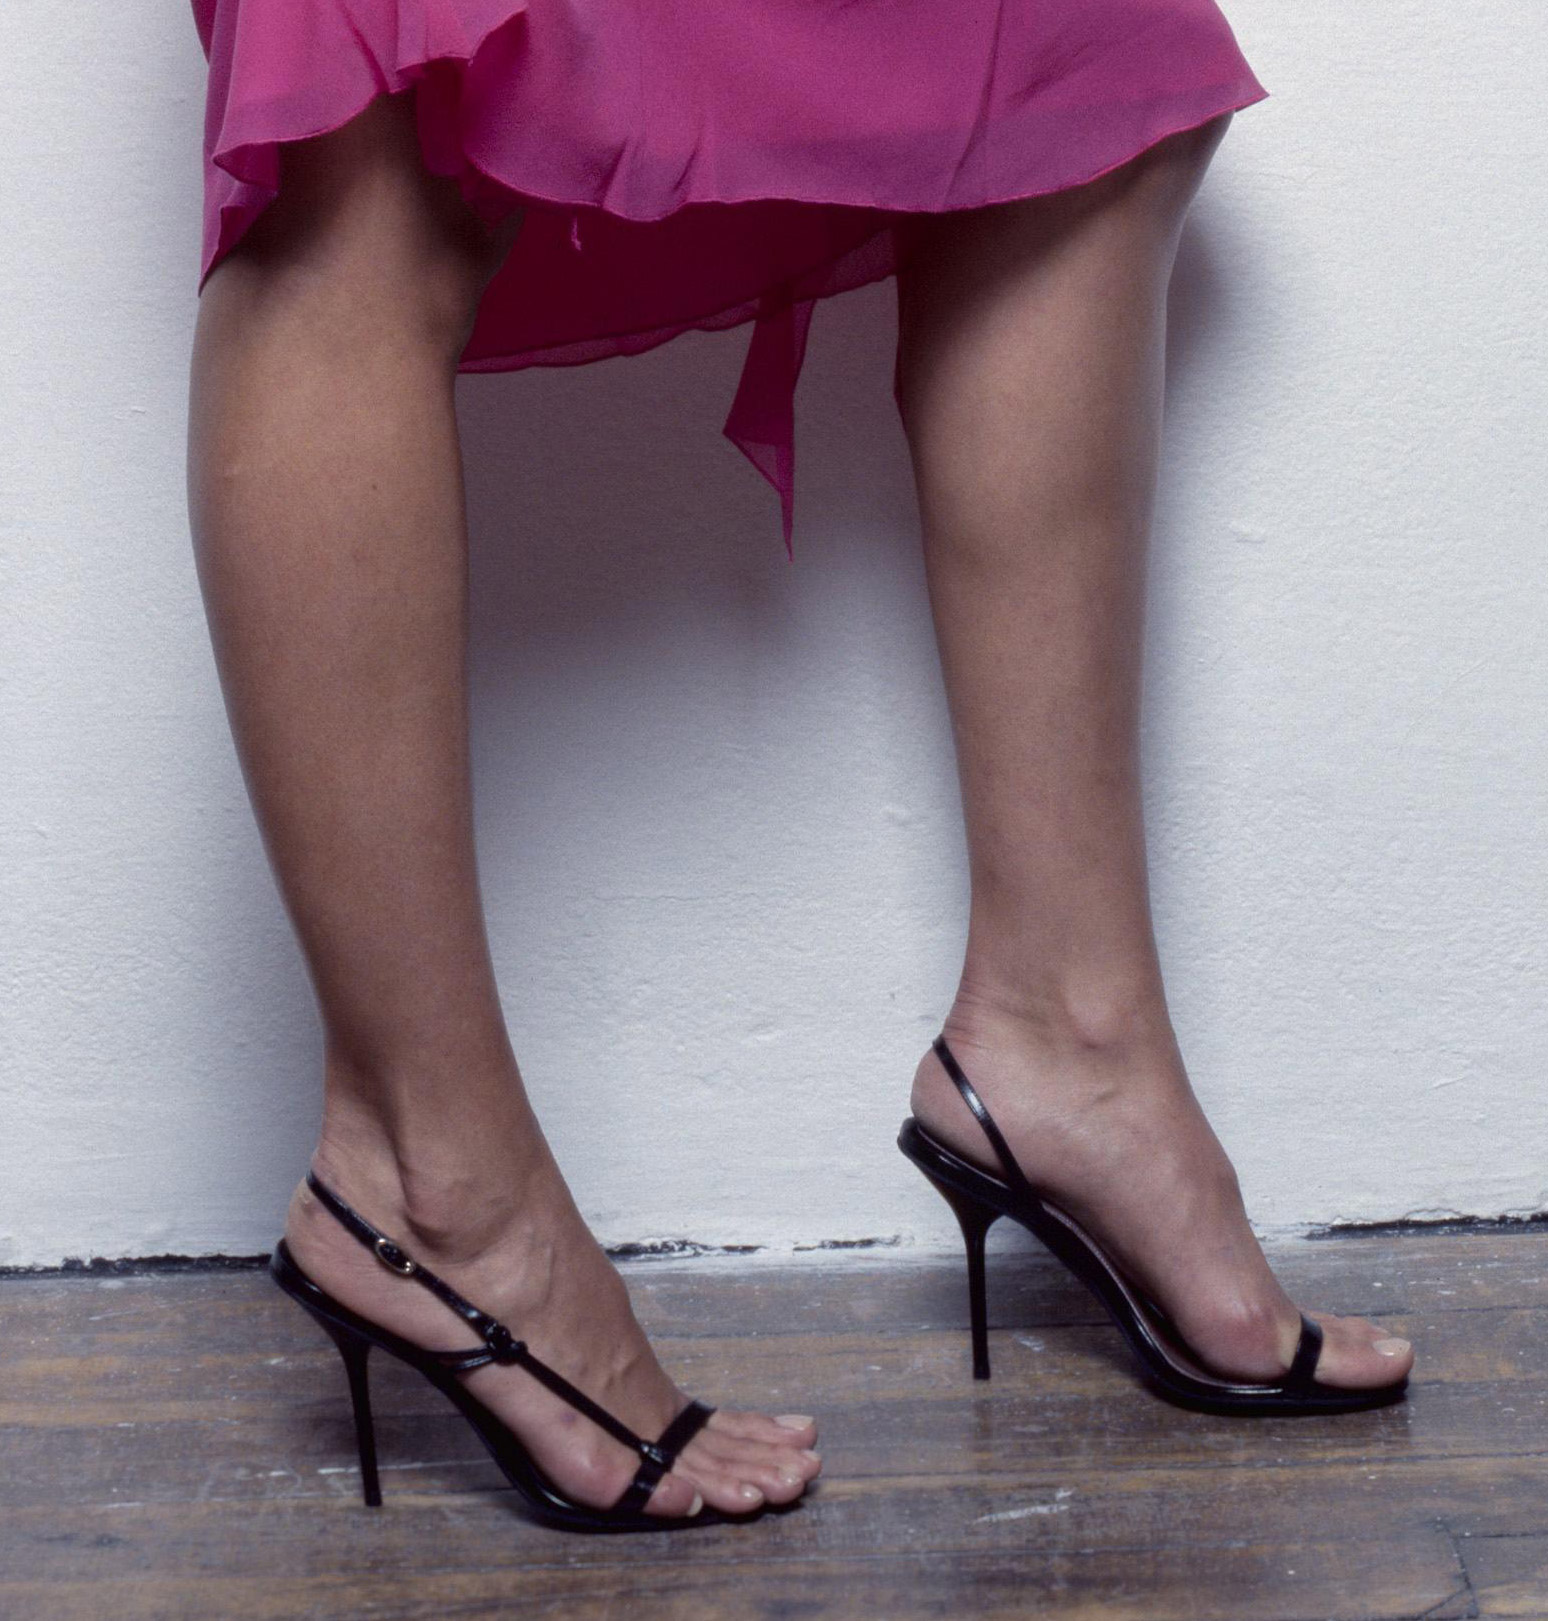 Feet Rebecca Loos nudes (87 photos), Pussy, Hot, Boobs, legs 2006